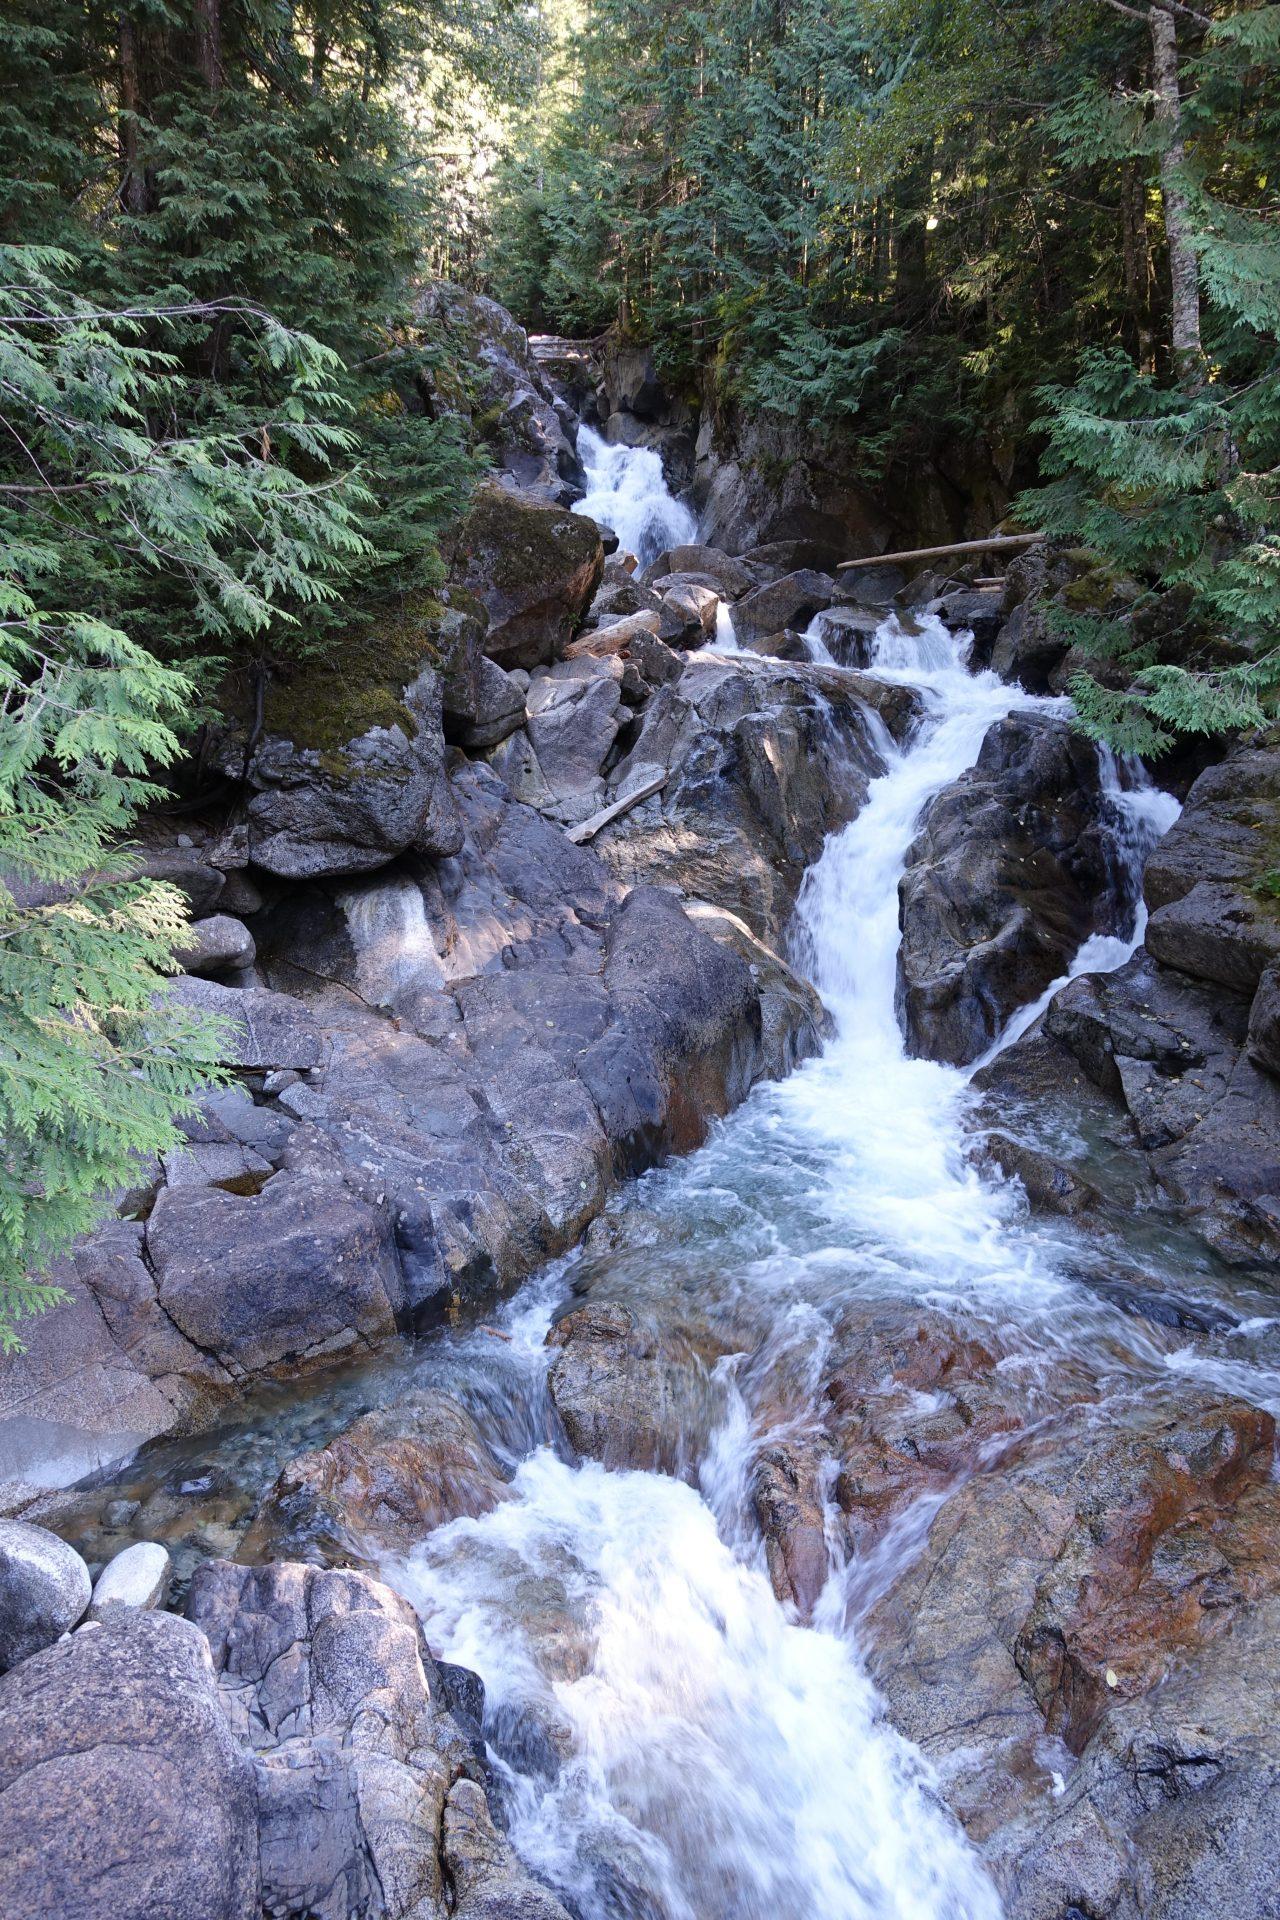 Deception Falls waterfall - one of Washington's Highway 2 roadside attractions